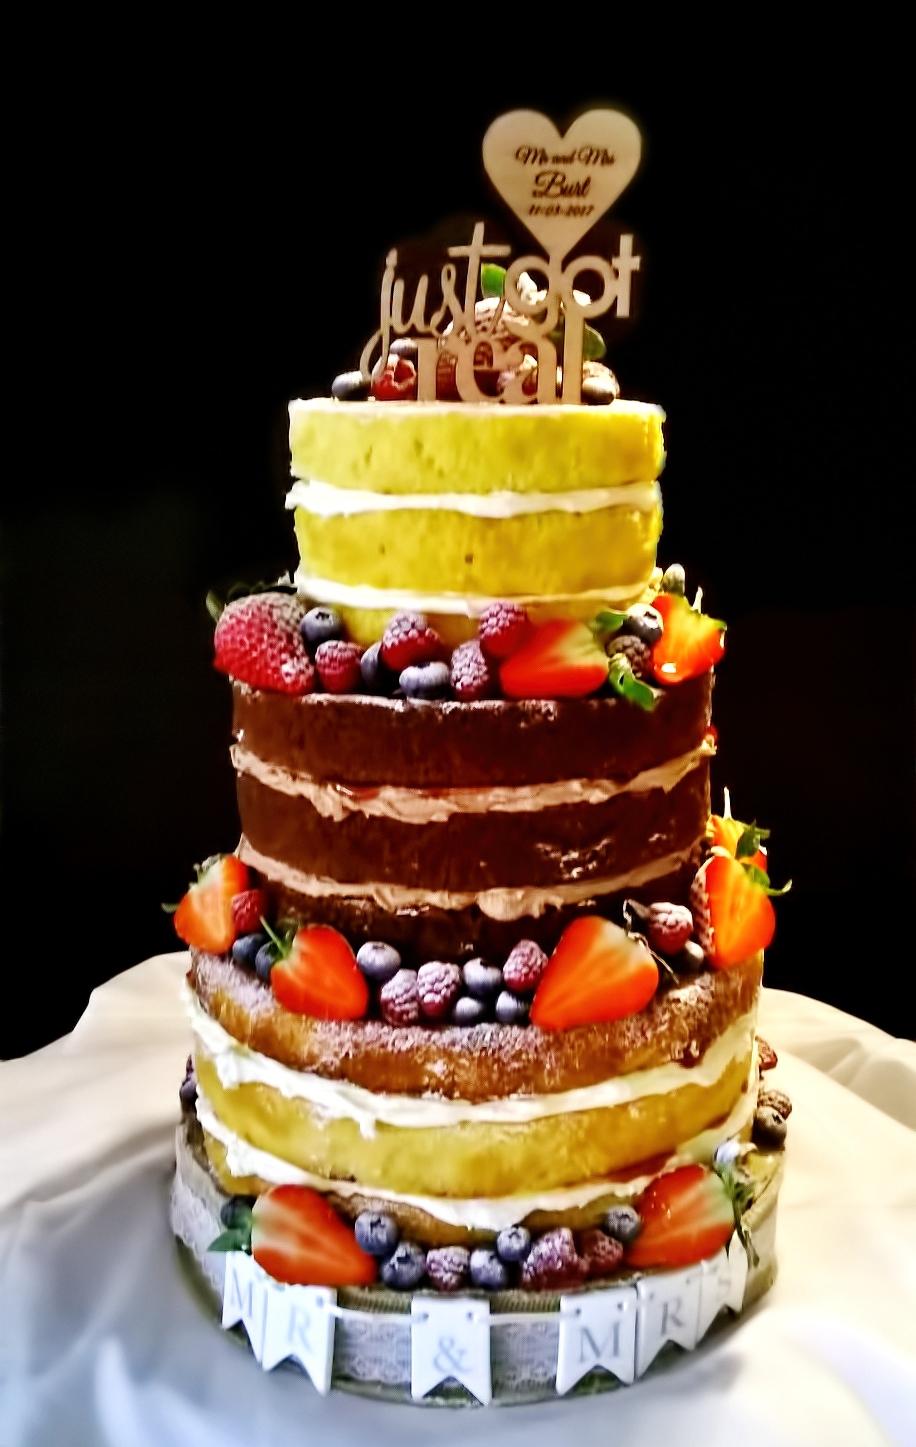 Just got real naked wedding cake gluten-